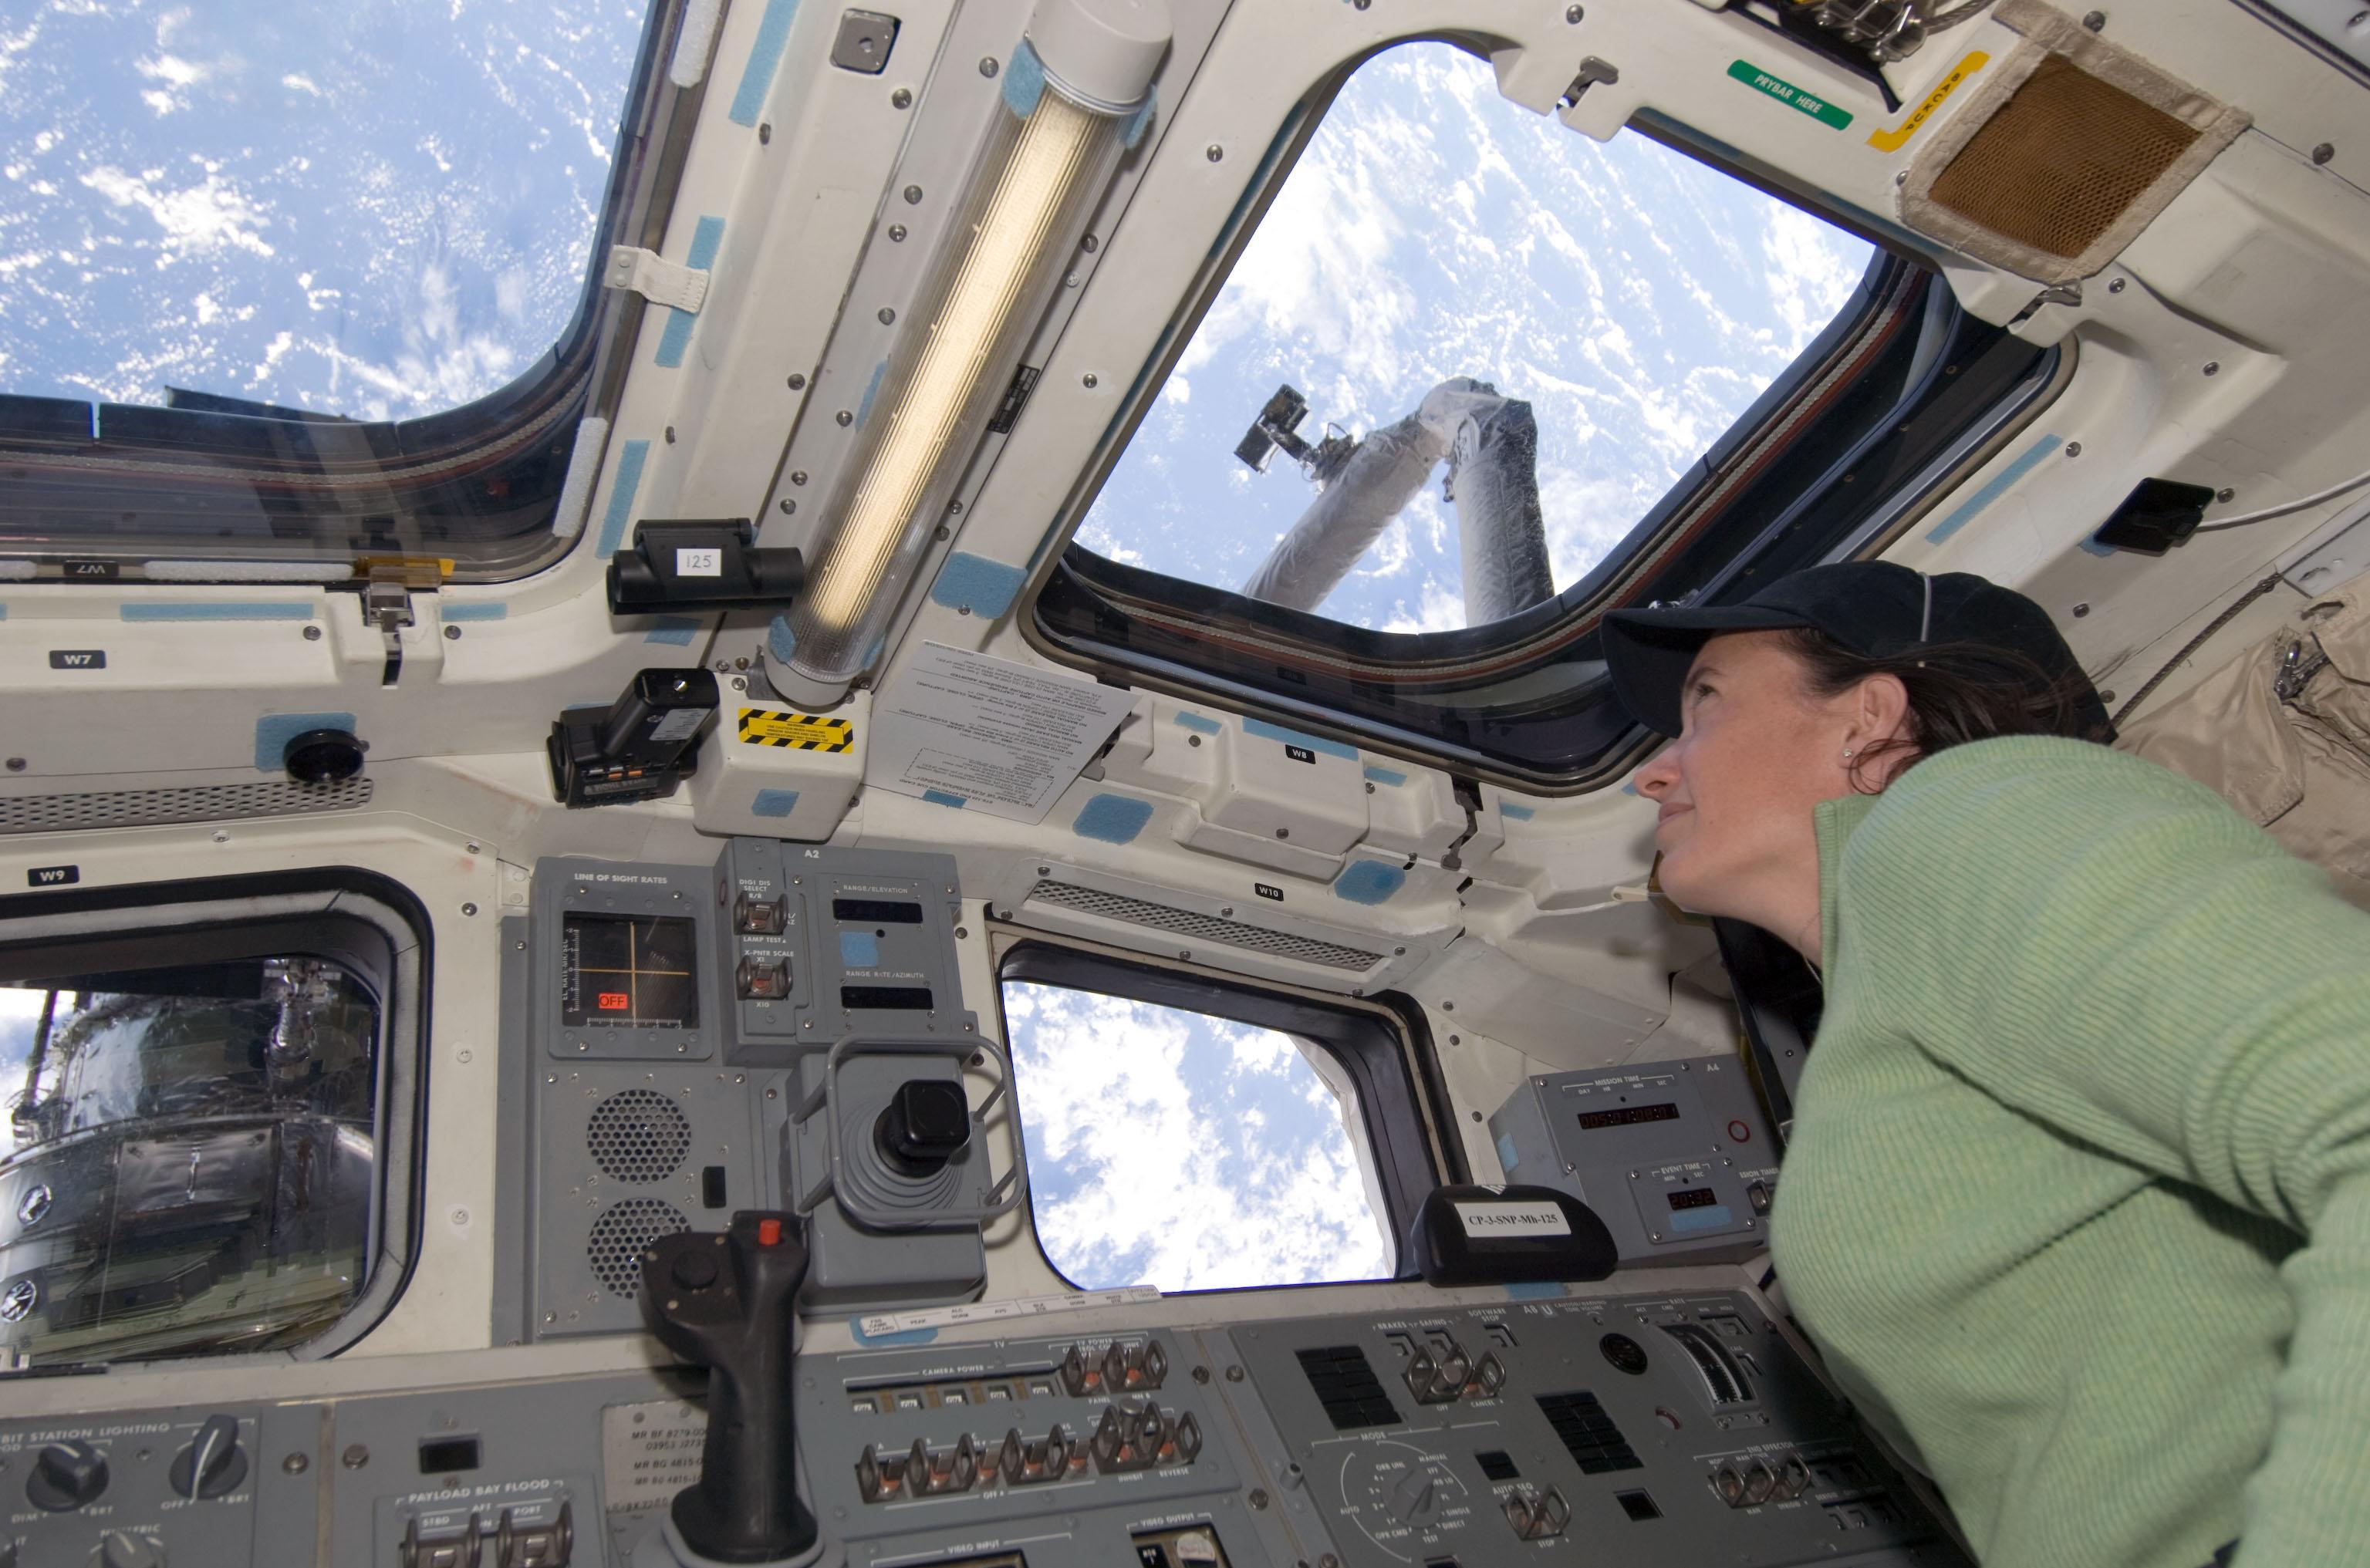 space shuttle window - photo #4